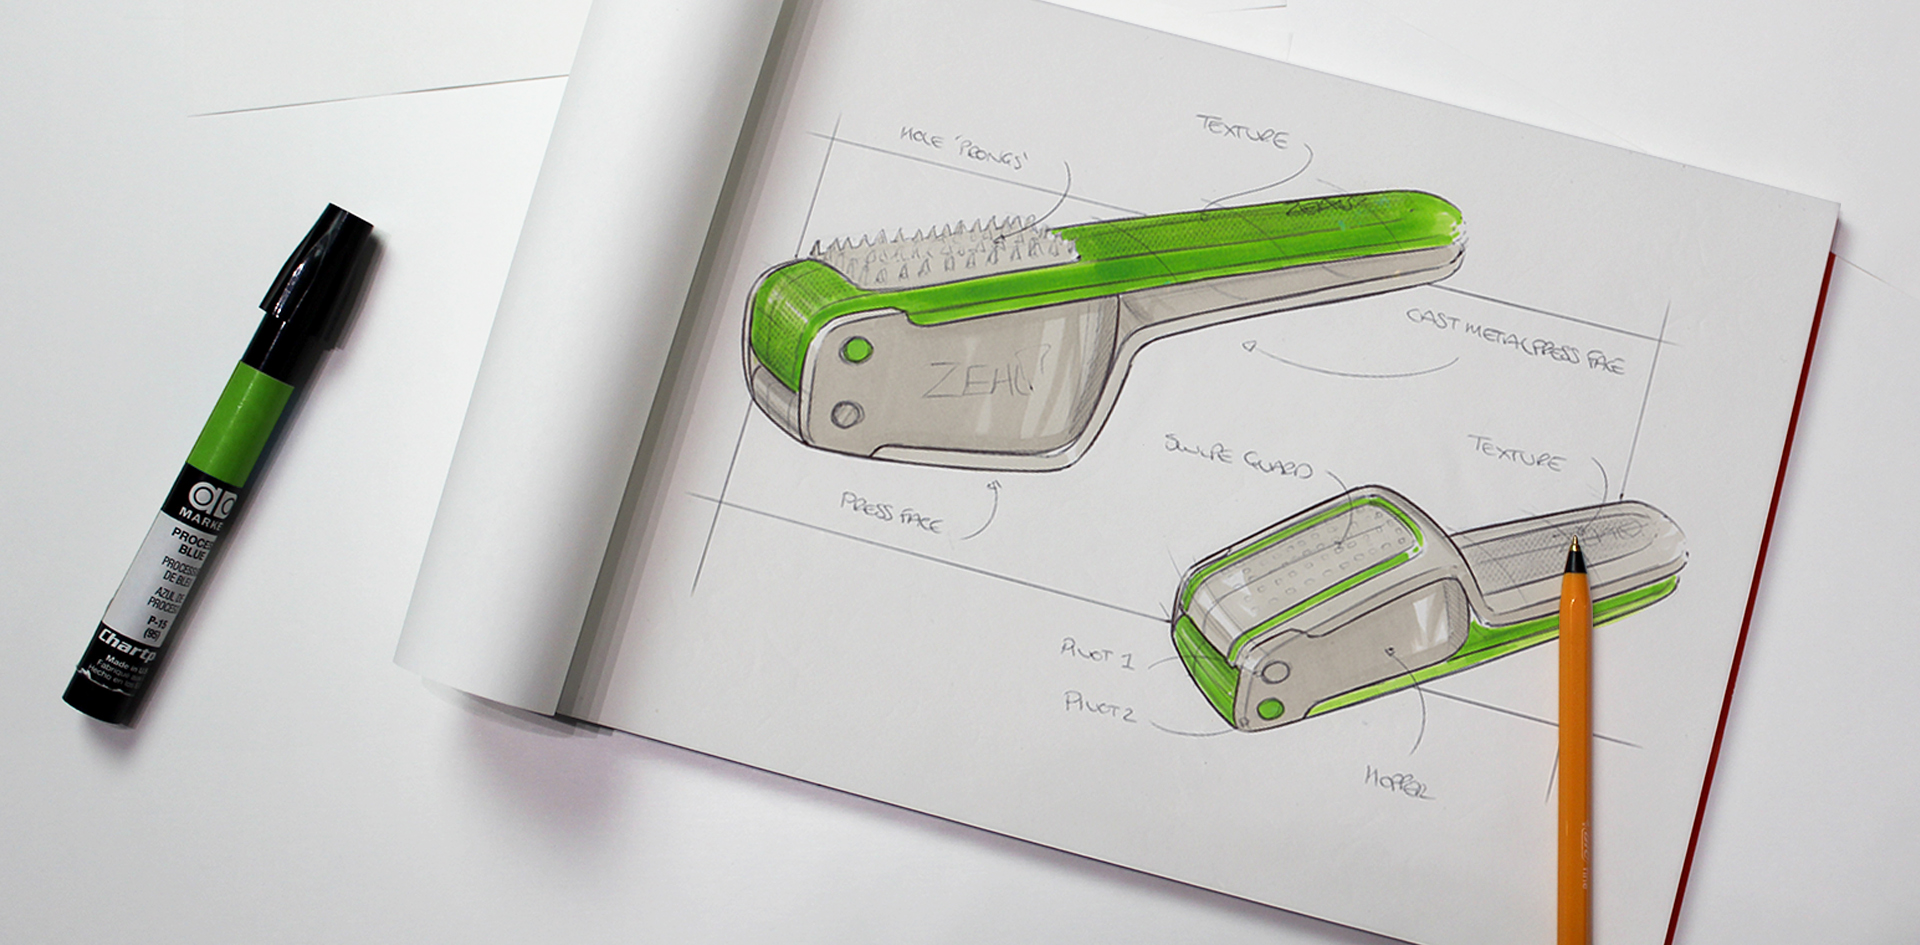 Zeal Garlic press |Sketching initial concept